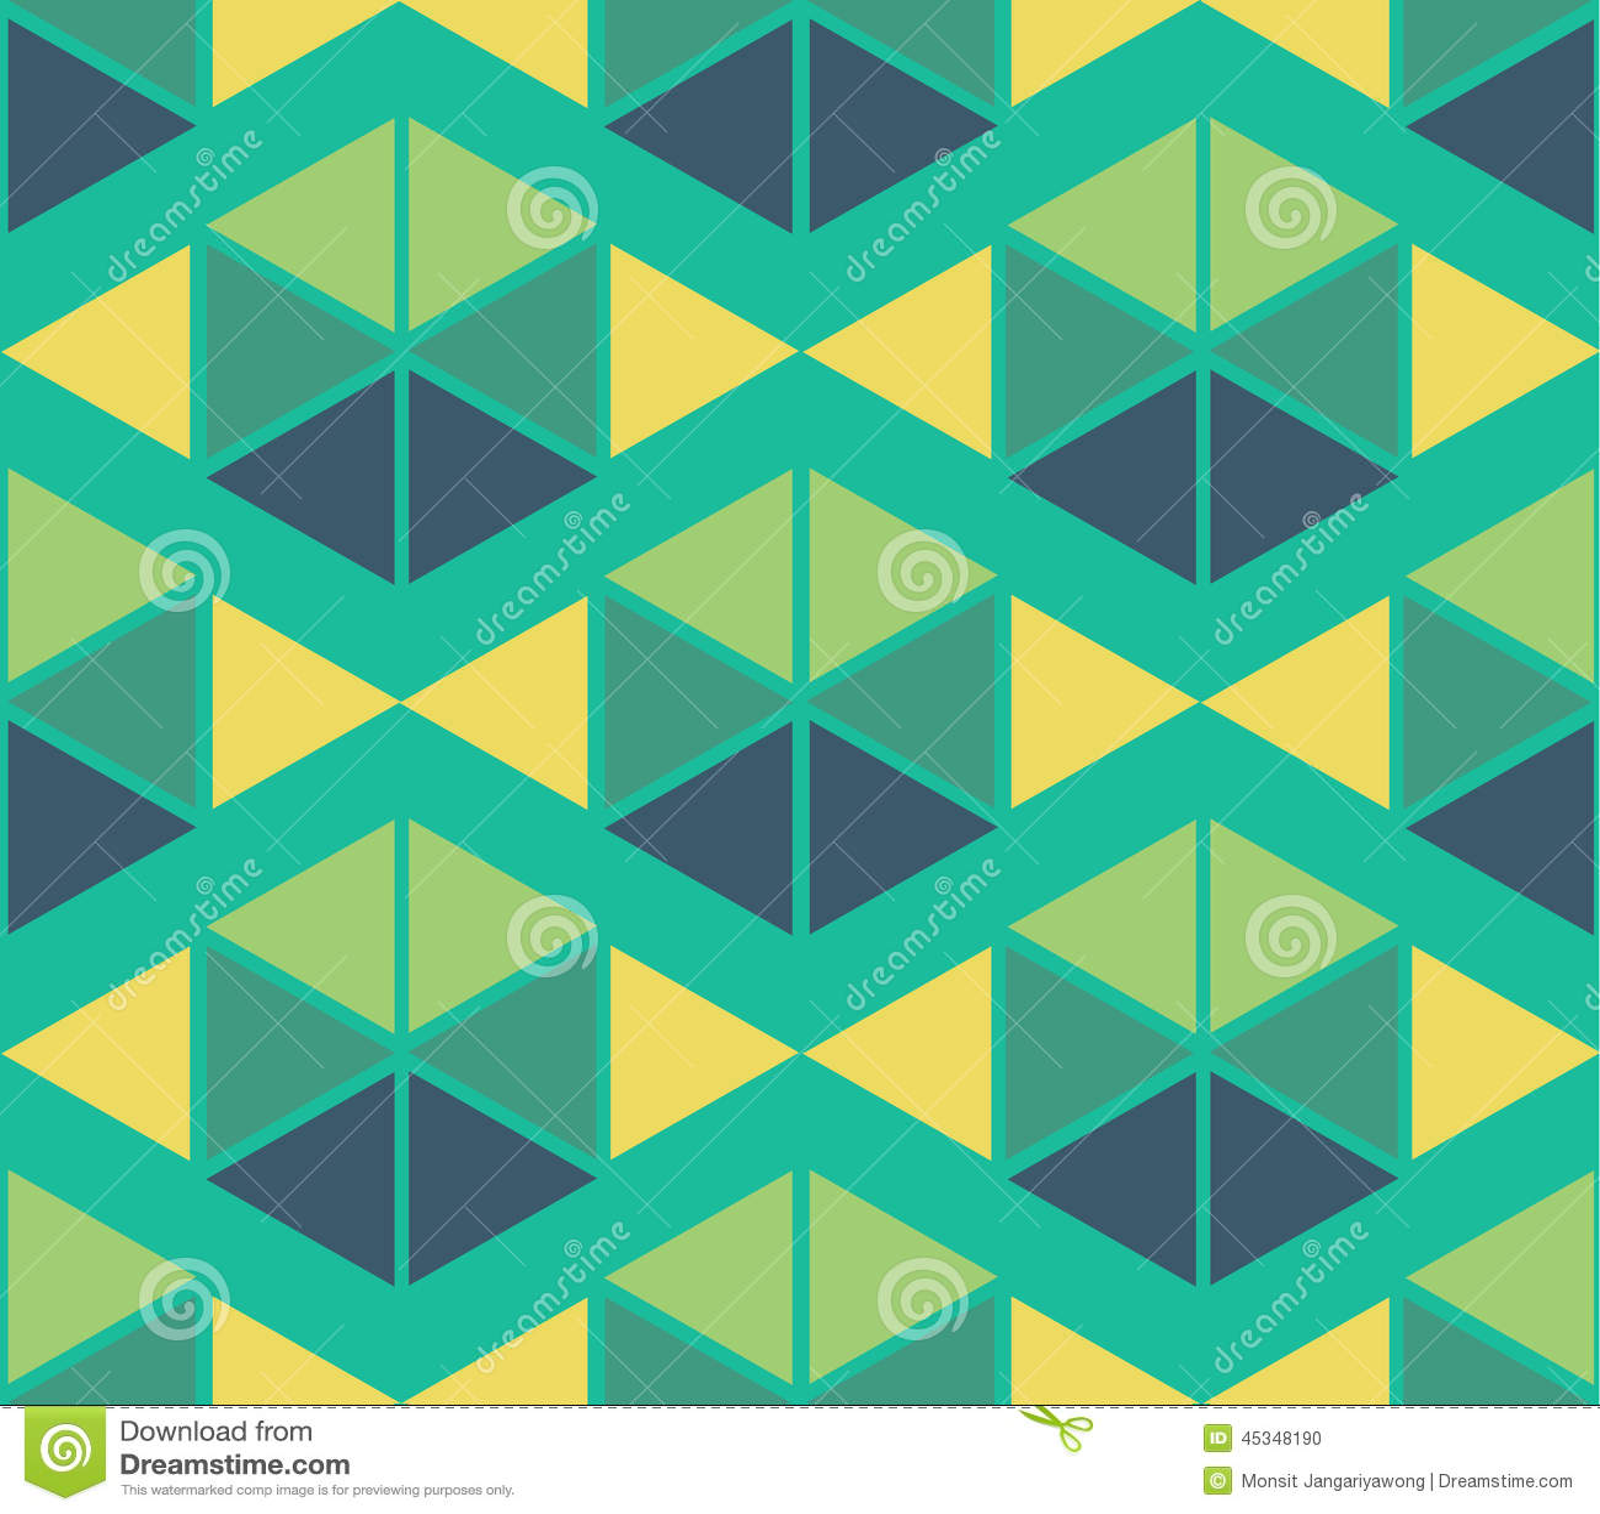 geometric yellow background illustration - photo #45